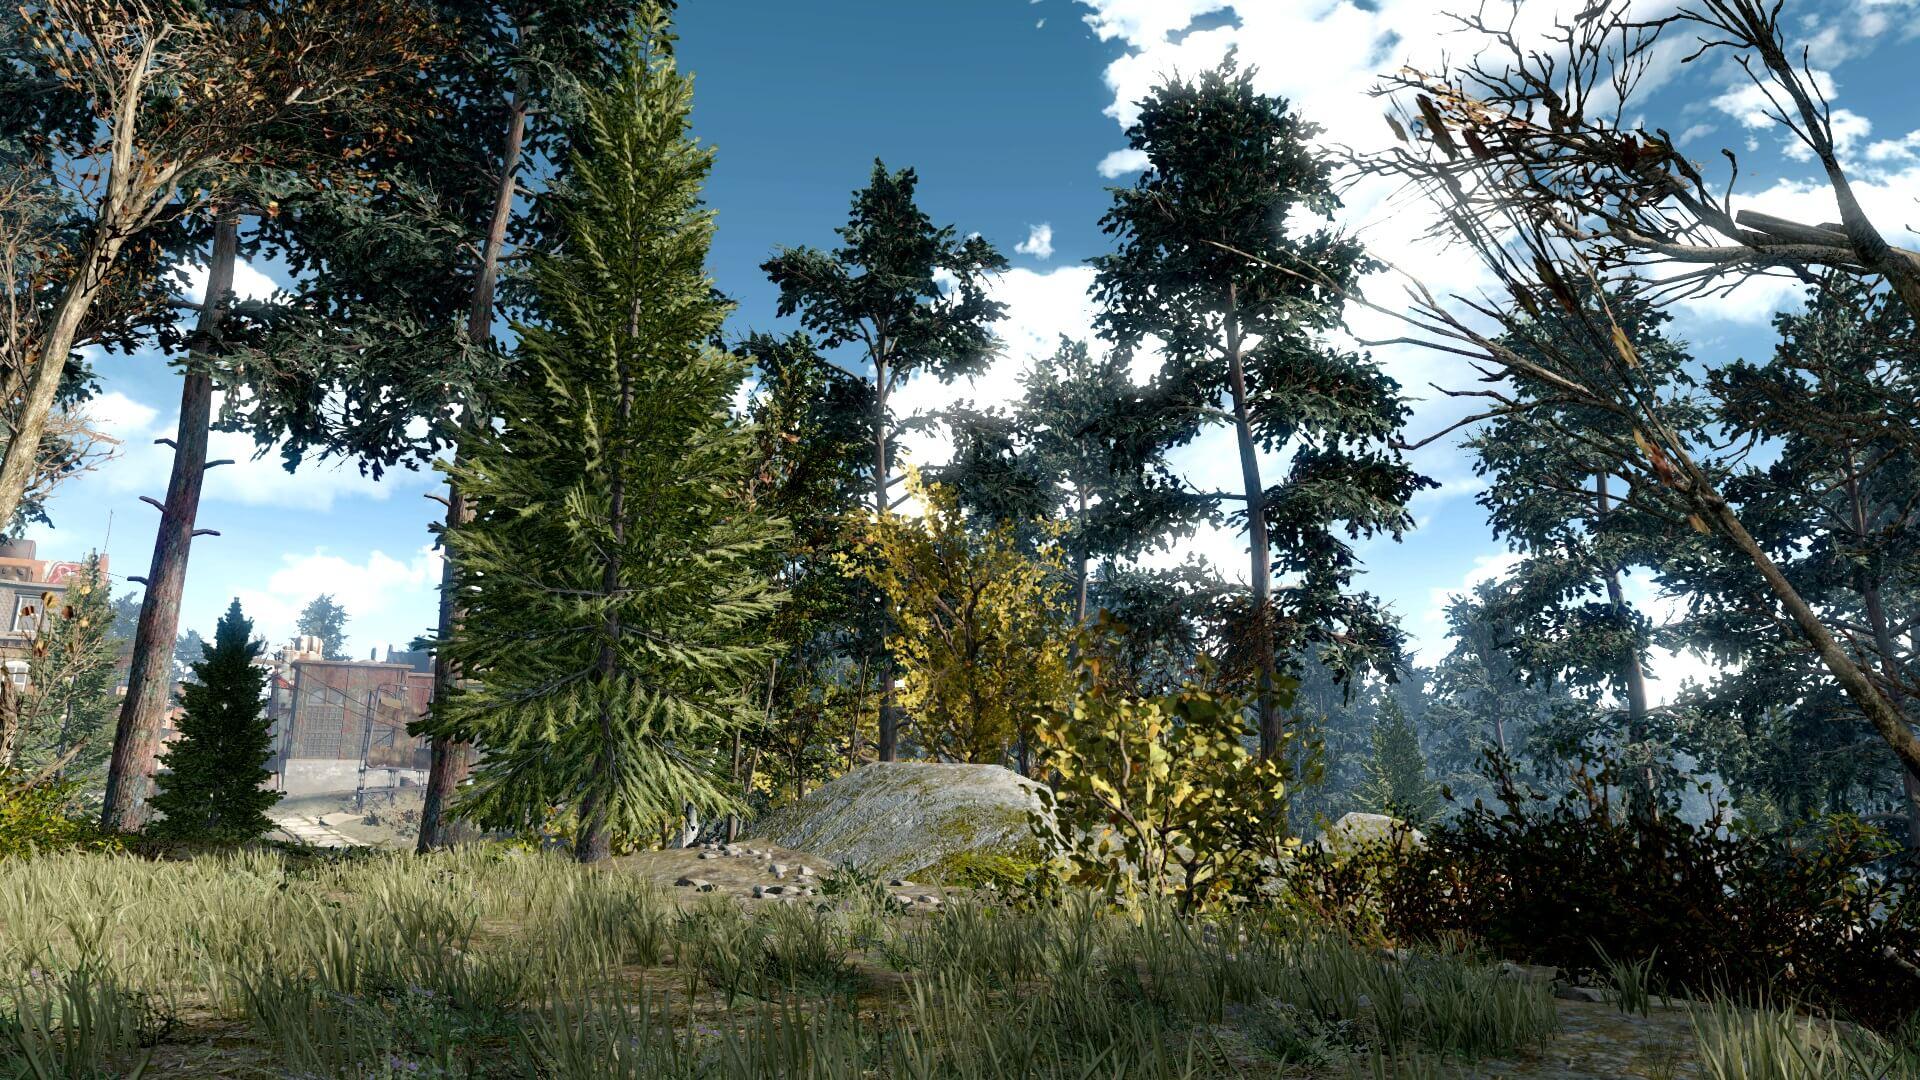 Моддер добавил 18 тысяч деревьев в Fallout 4